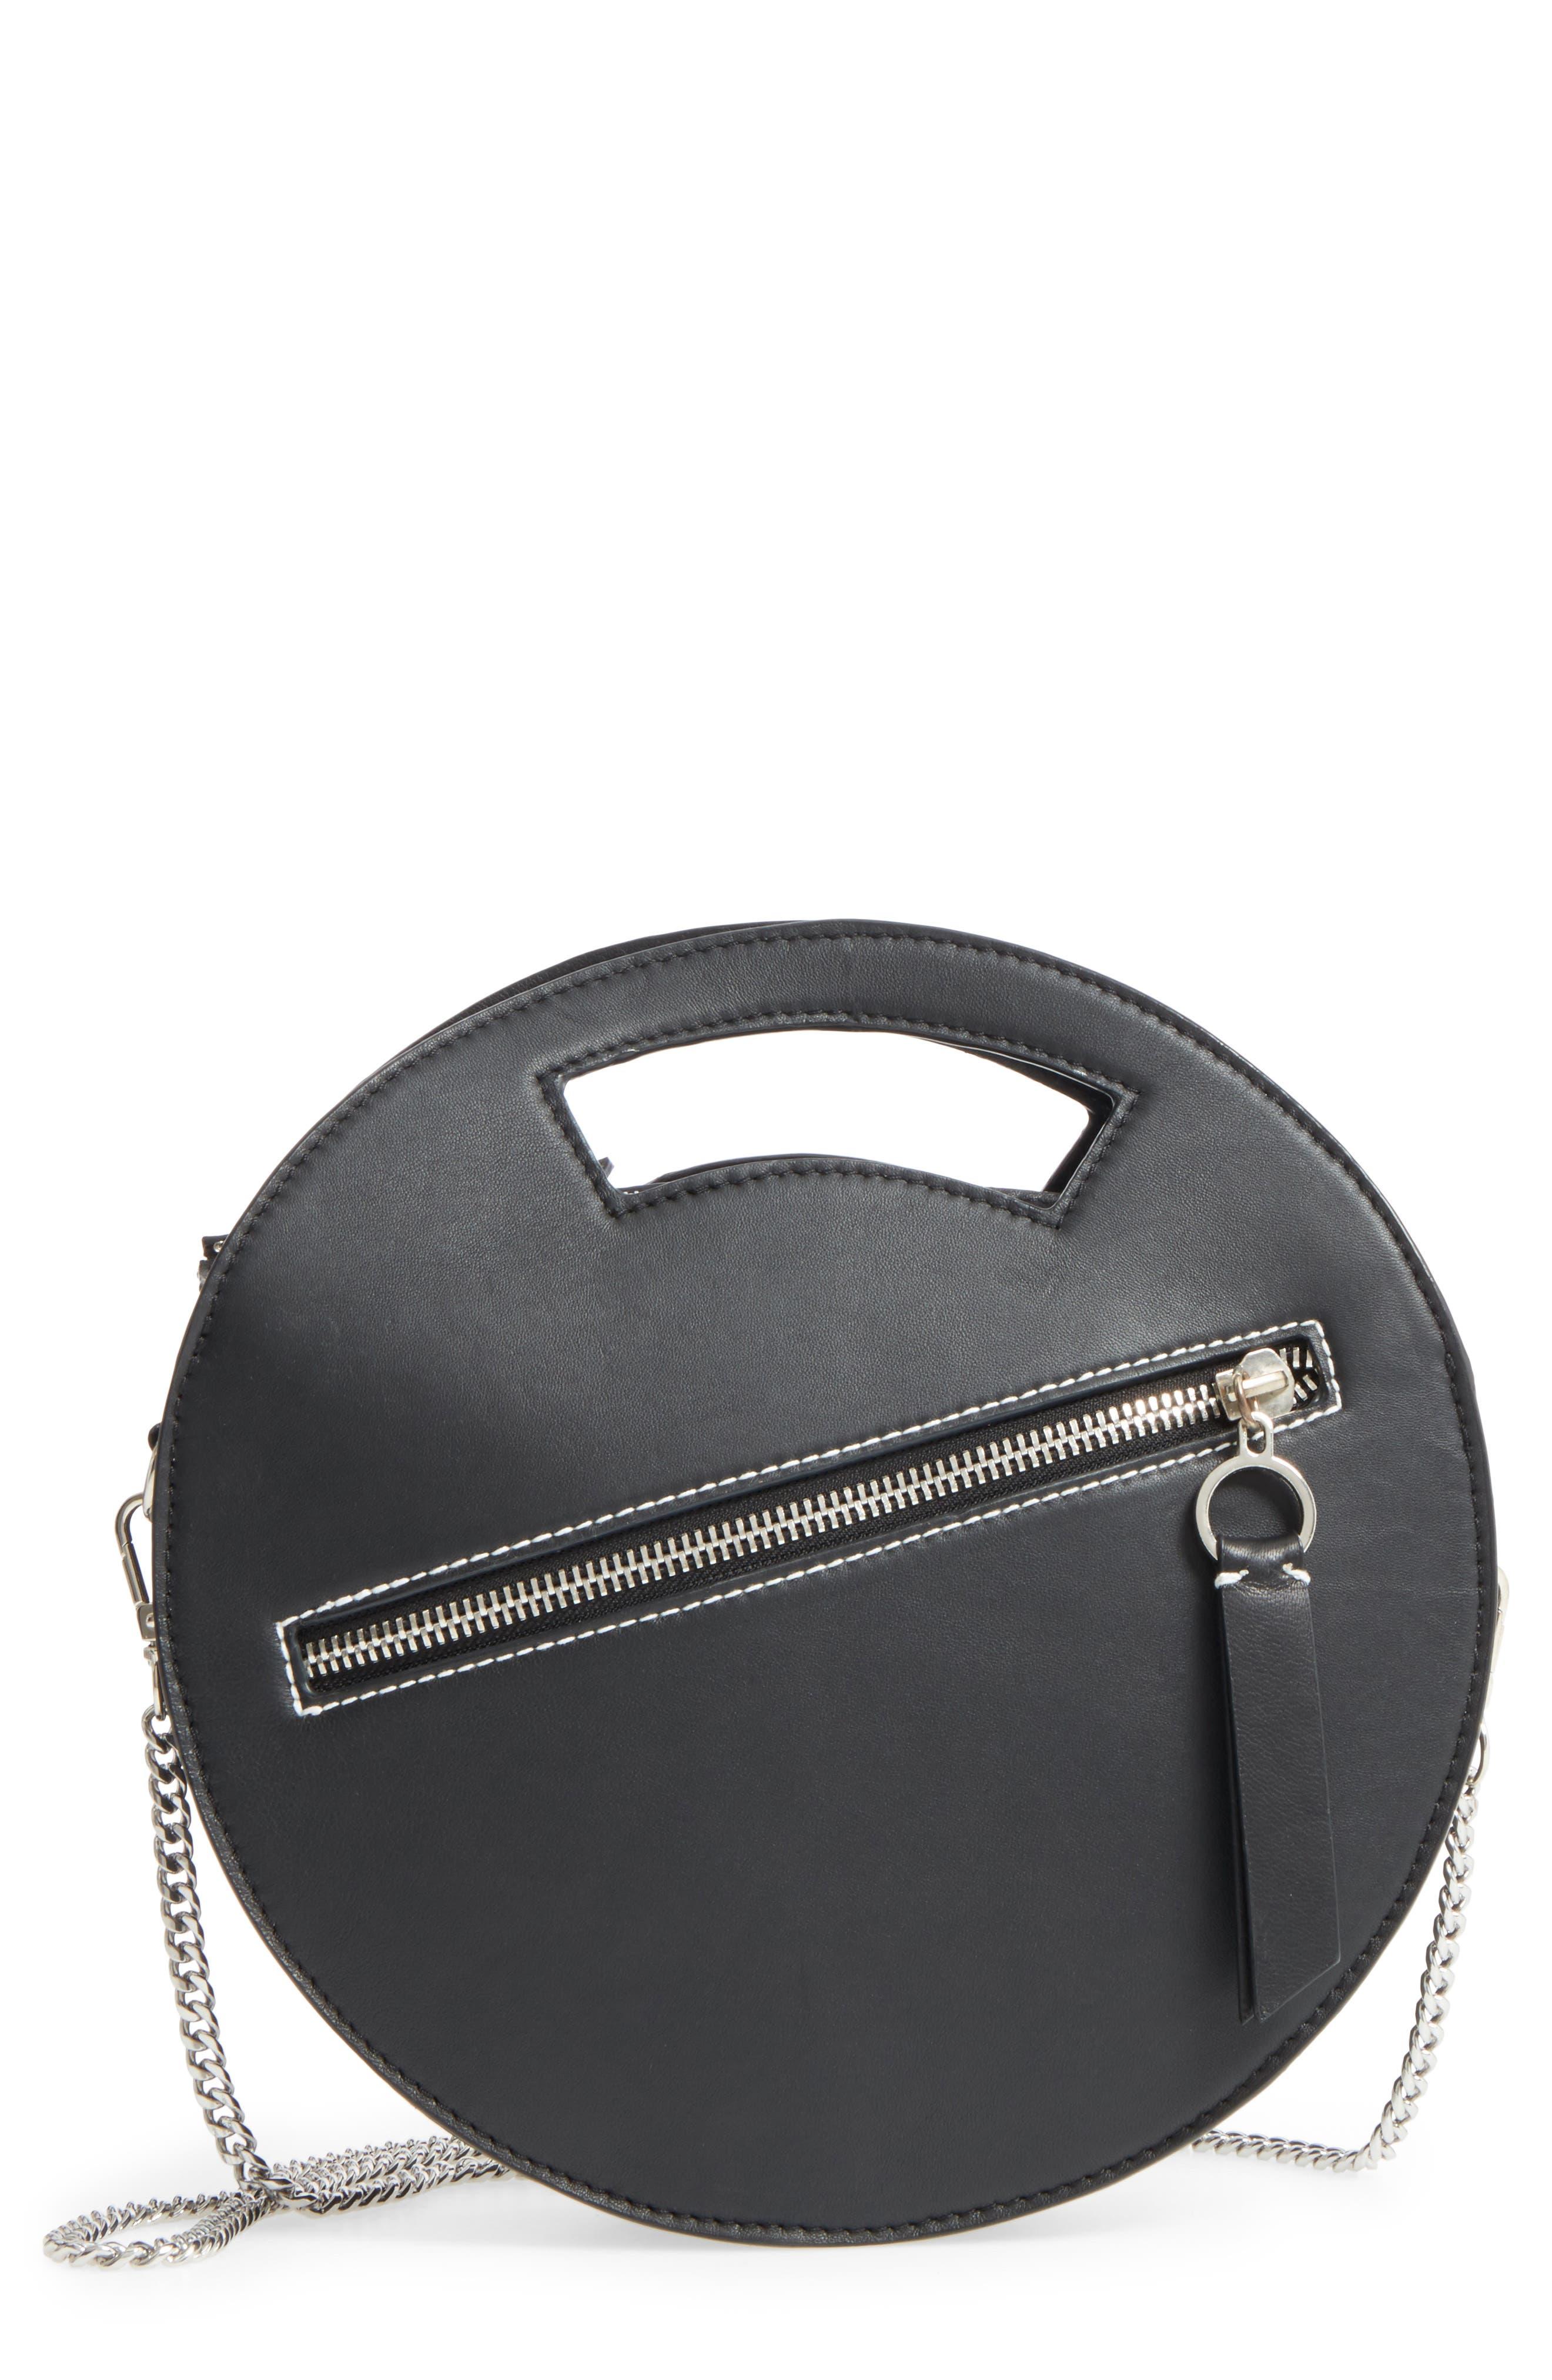 Premium Leather Circle Crossbody Bag,                             Main thumbnail 1, color,                             001